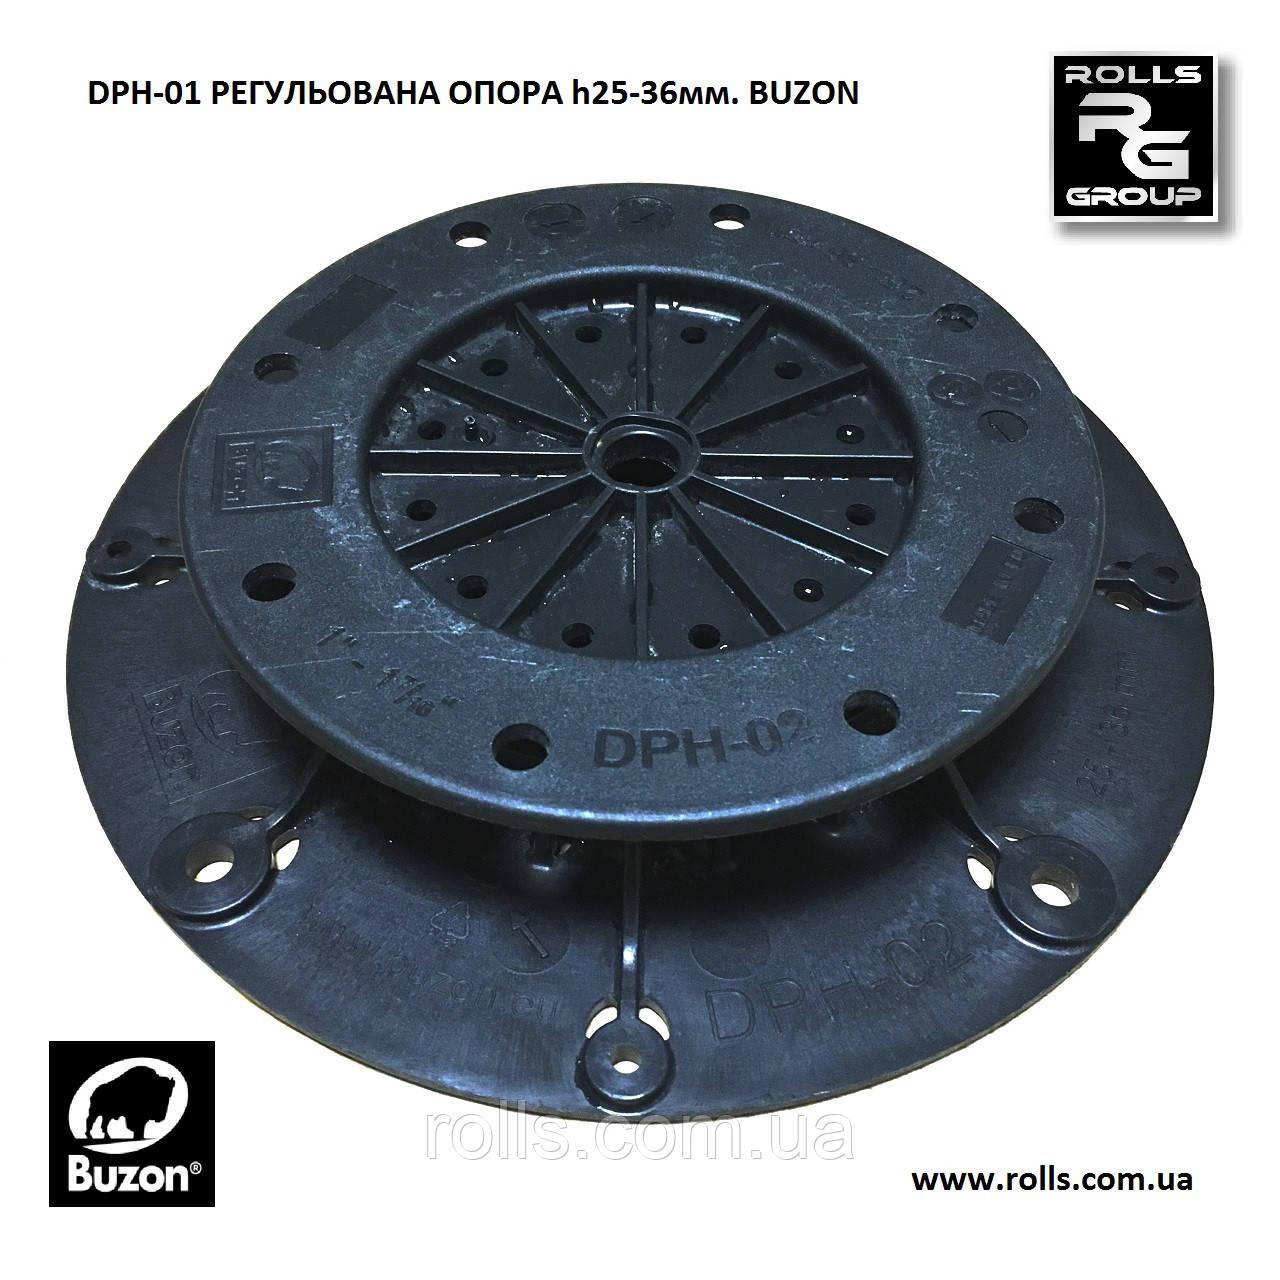 DPH-02-PH5 Buzon 33-44мм. Винтовая регулируемая опора со встроенным корректором угла наклона поверхности 0-5%